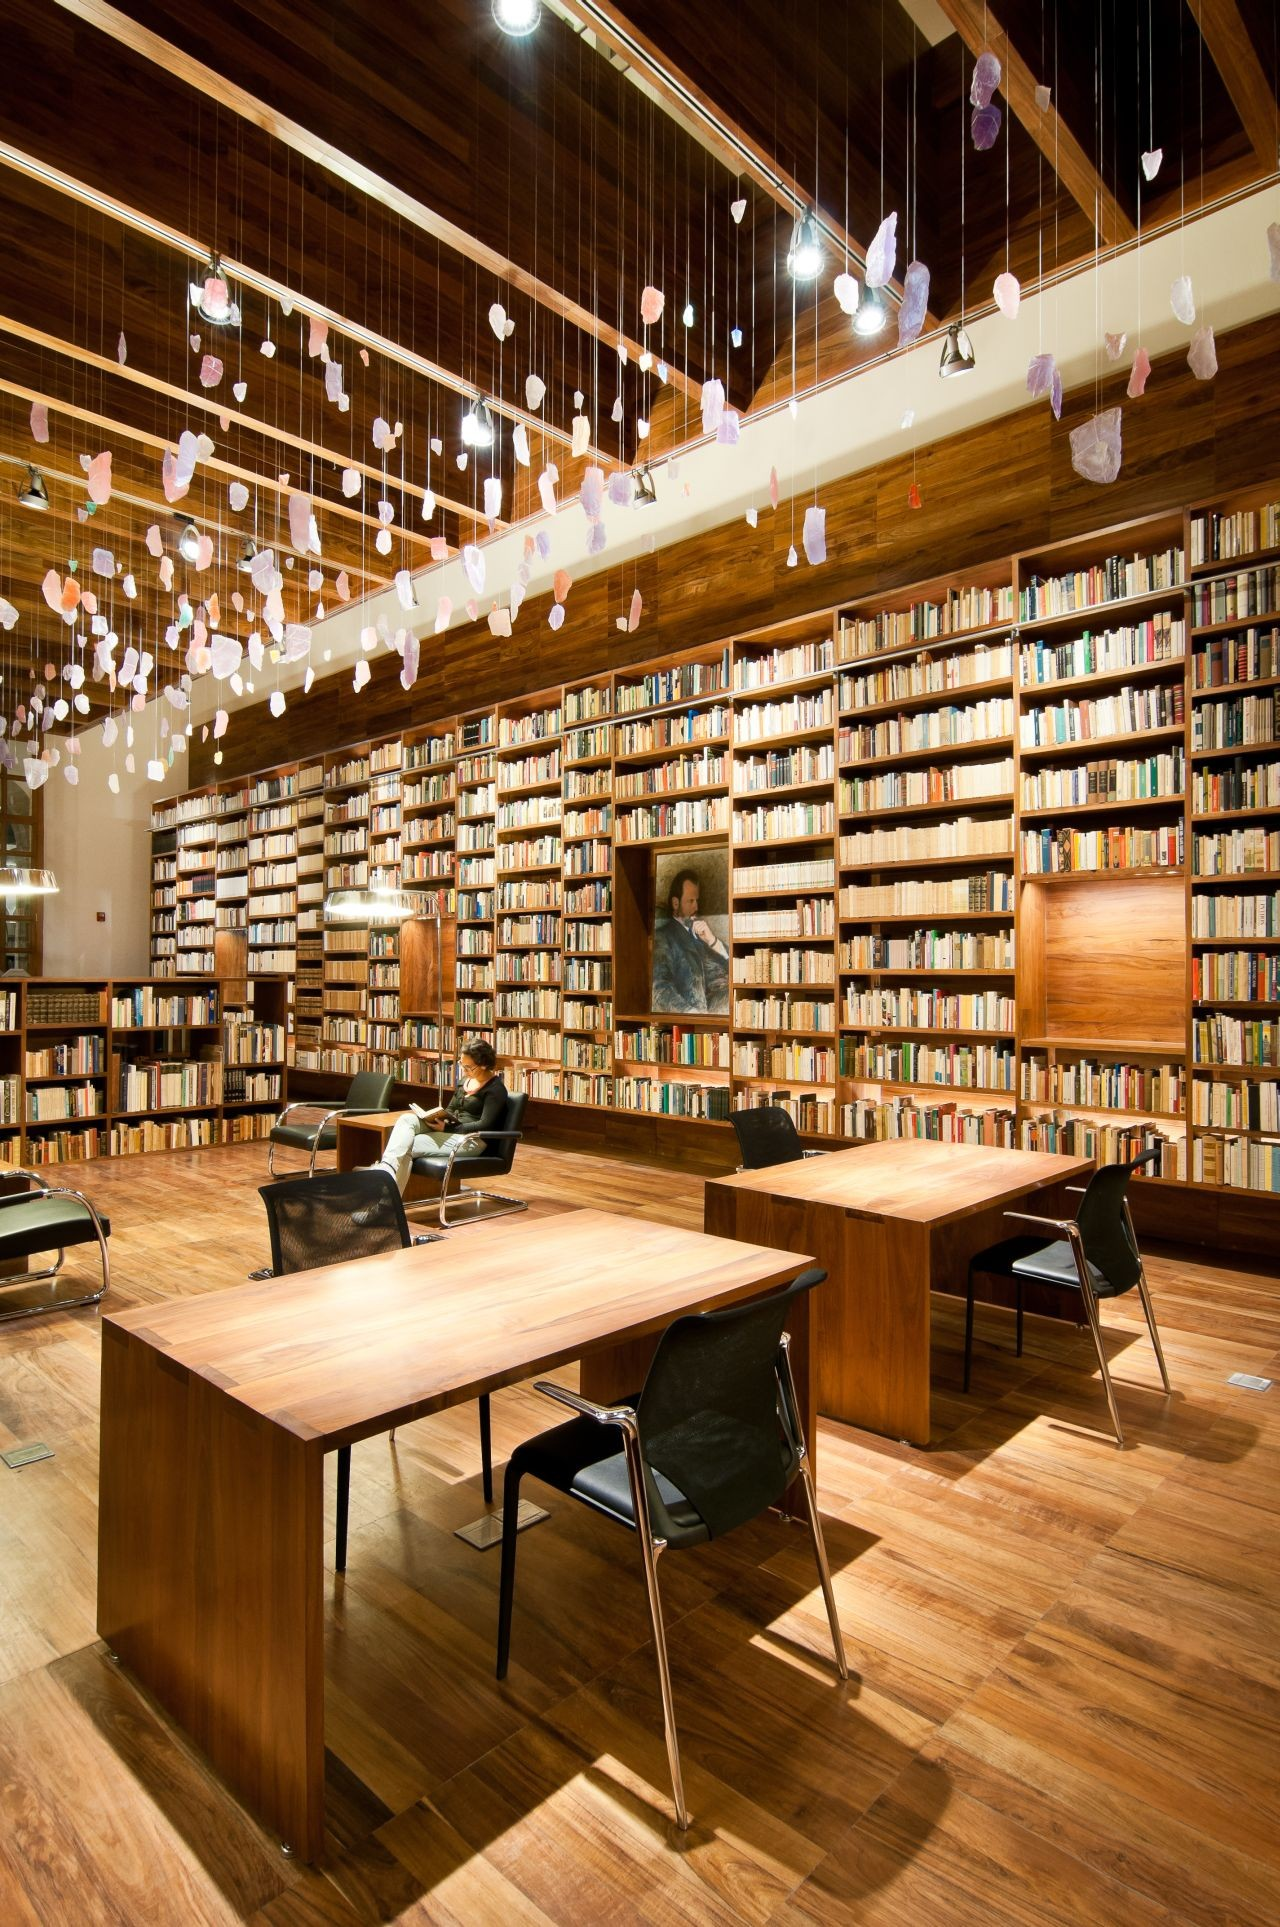 Jaime garcia terres library arquitectura 911sc archdaily - Arquitectura interior ...